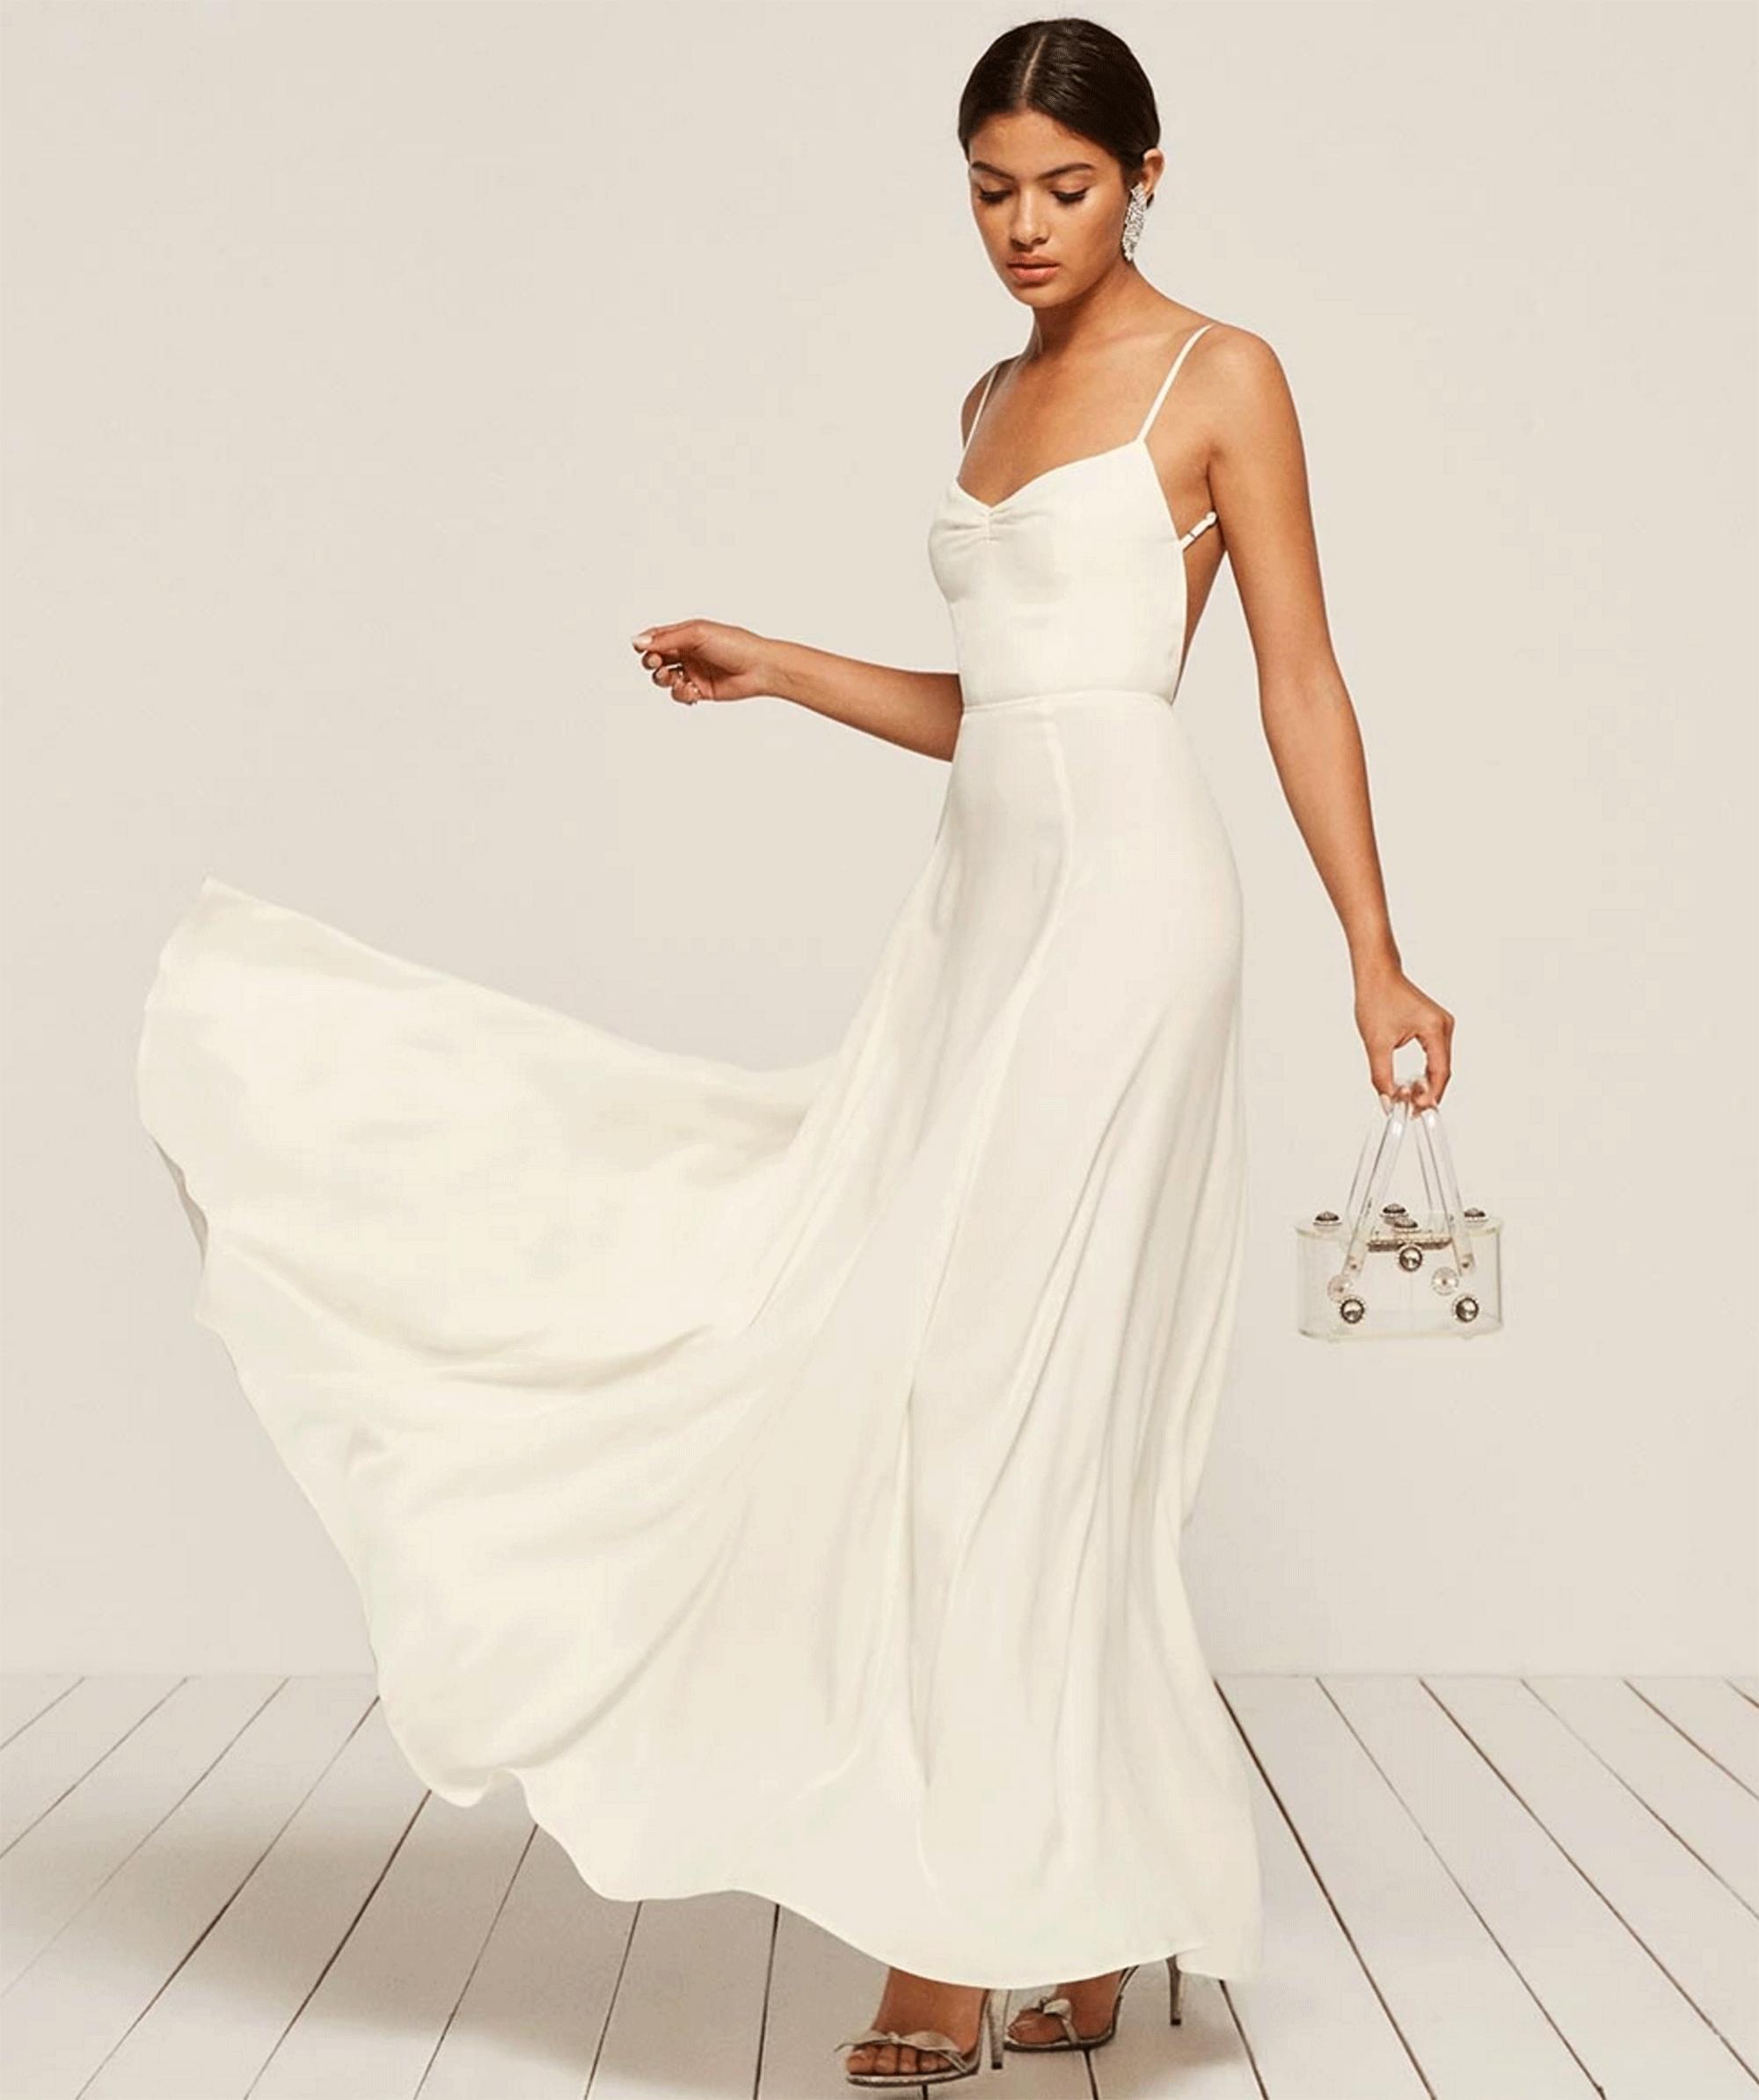 Under GBP500 Wedding Dresses